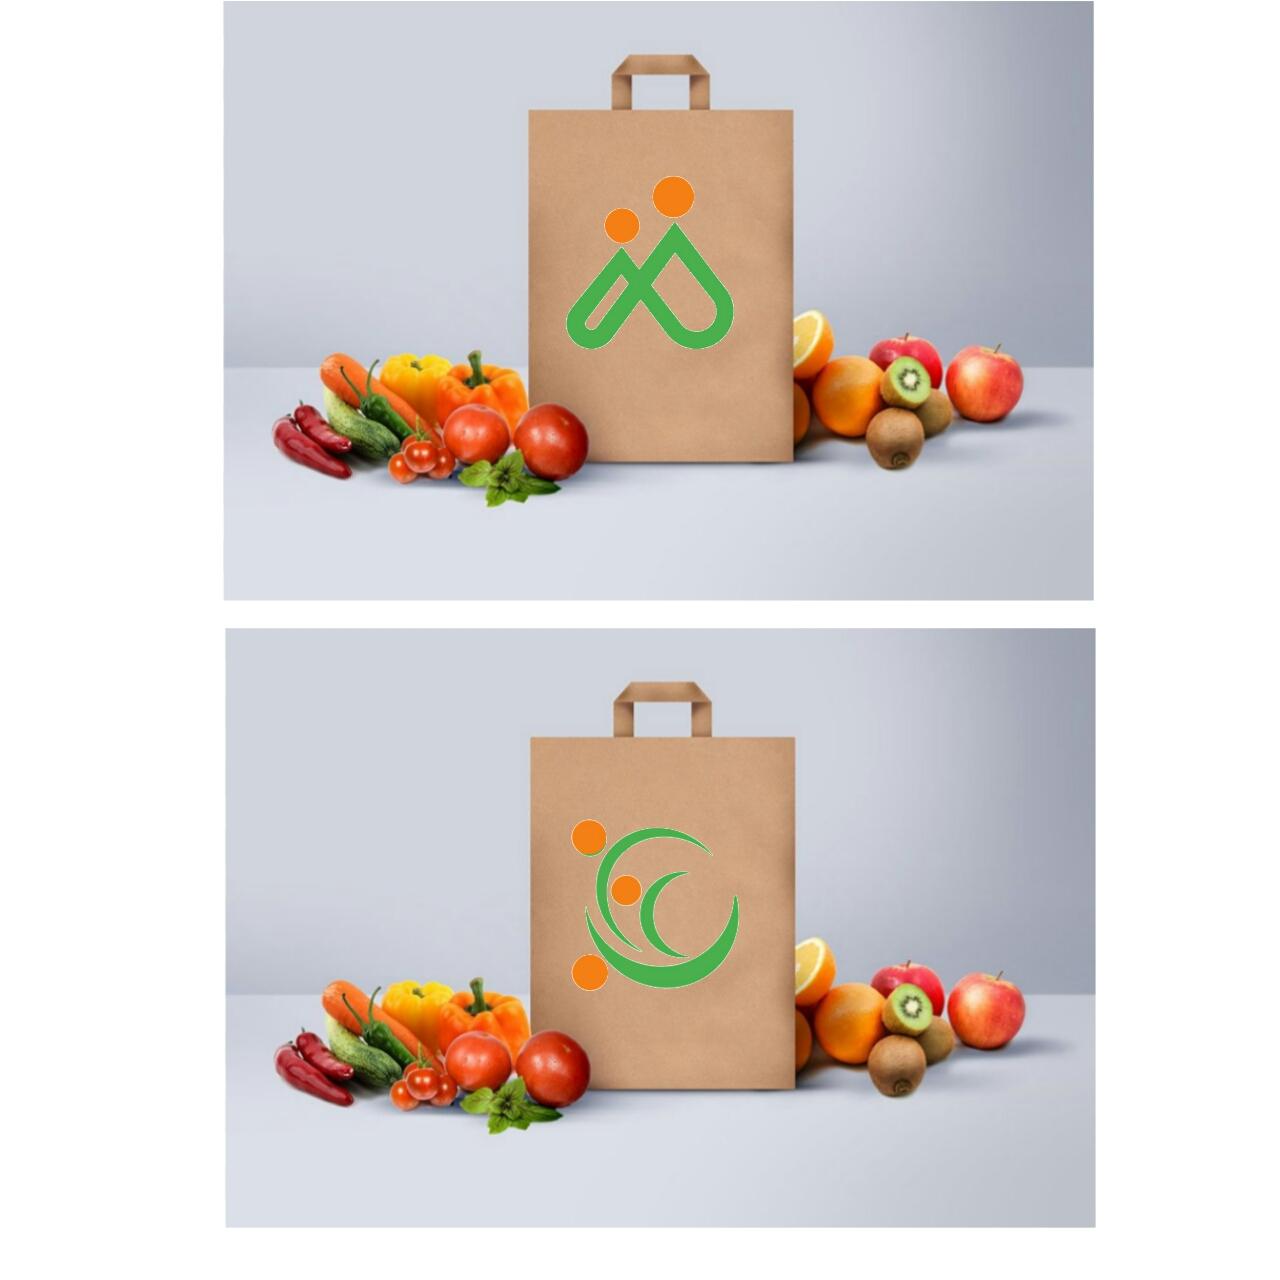 "Разработайте логотип для торговой марки ""Семья довольна"" фото f_4195b9d5ab88d95b.jpg"